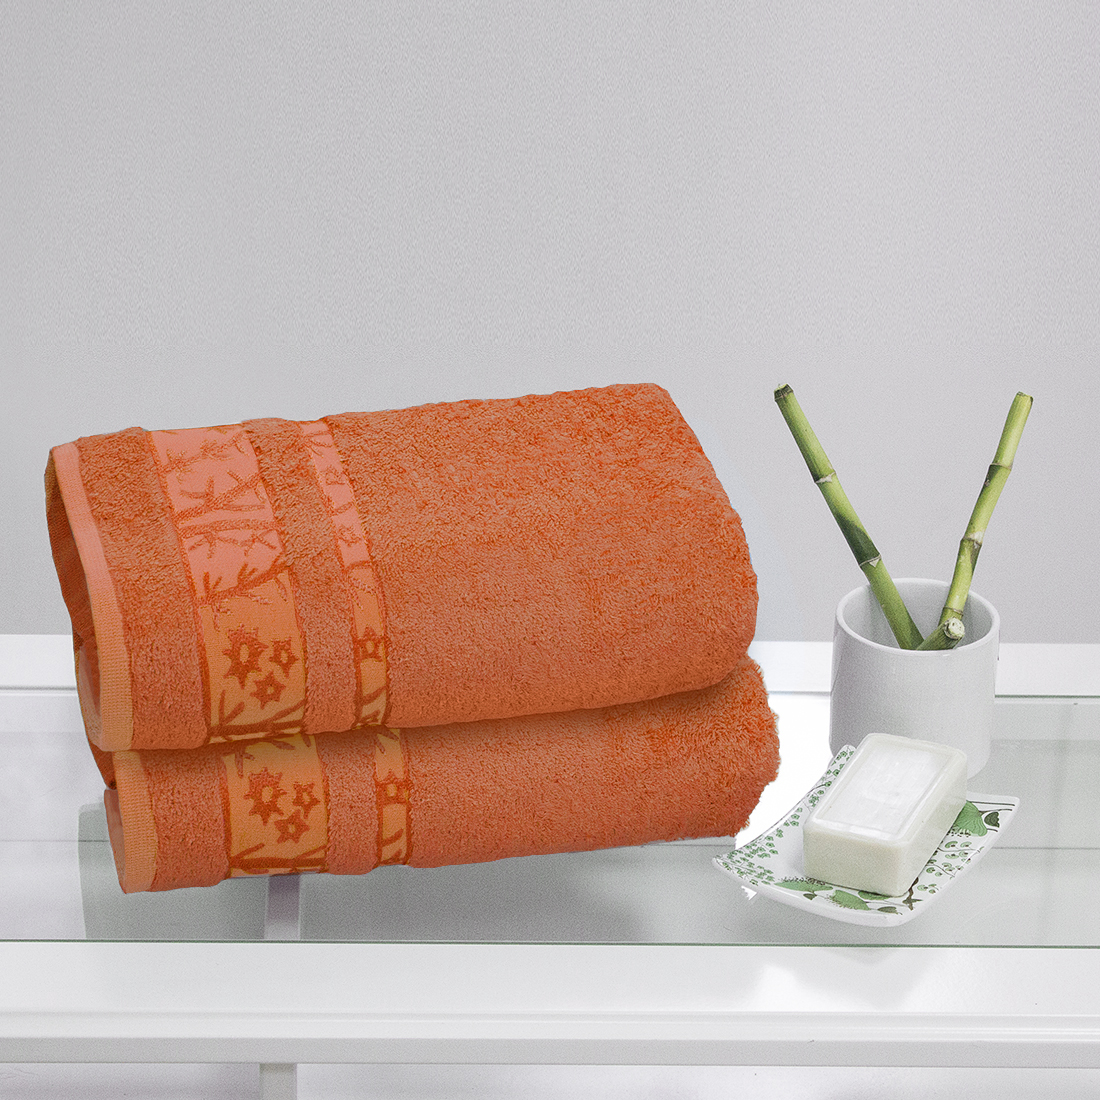 Полотенца Juanna Полотенце Софт Цвет: Оранжевый (50х90 см - 2 шт) набор из 3 полотенец merzuka sakura 50х90 2 70х140 8432 оранжевый